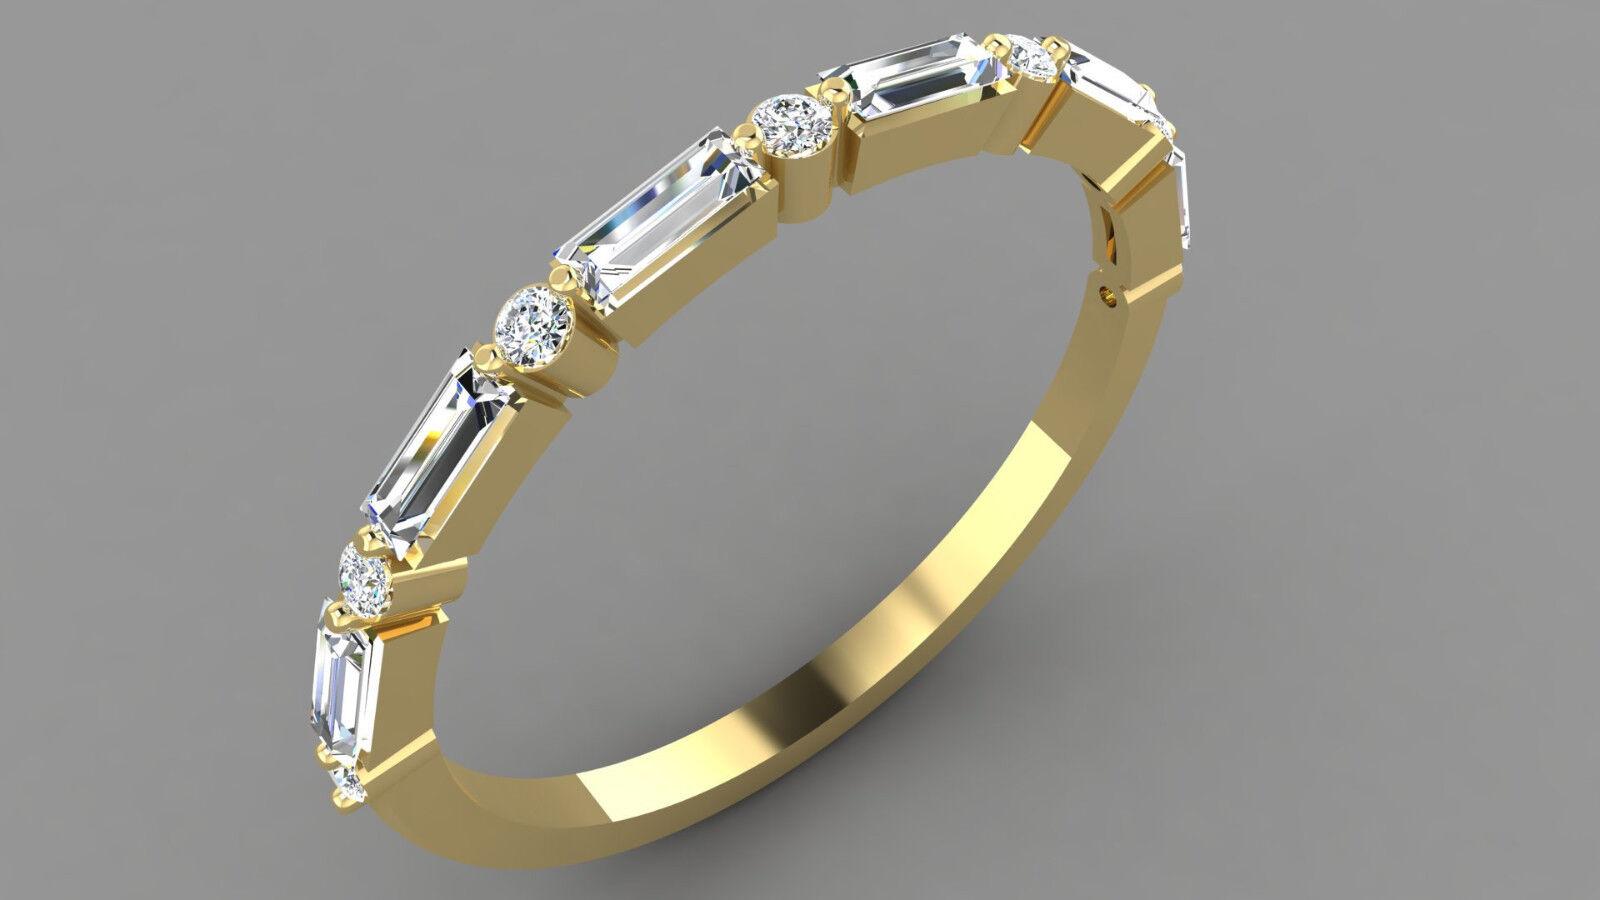 14k solid gold ring natural diamond ring baguette ring engagement ring DER0156